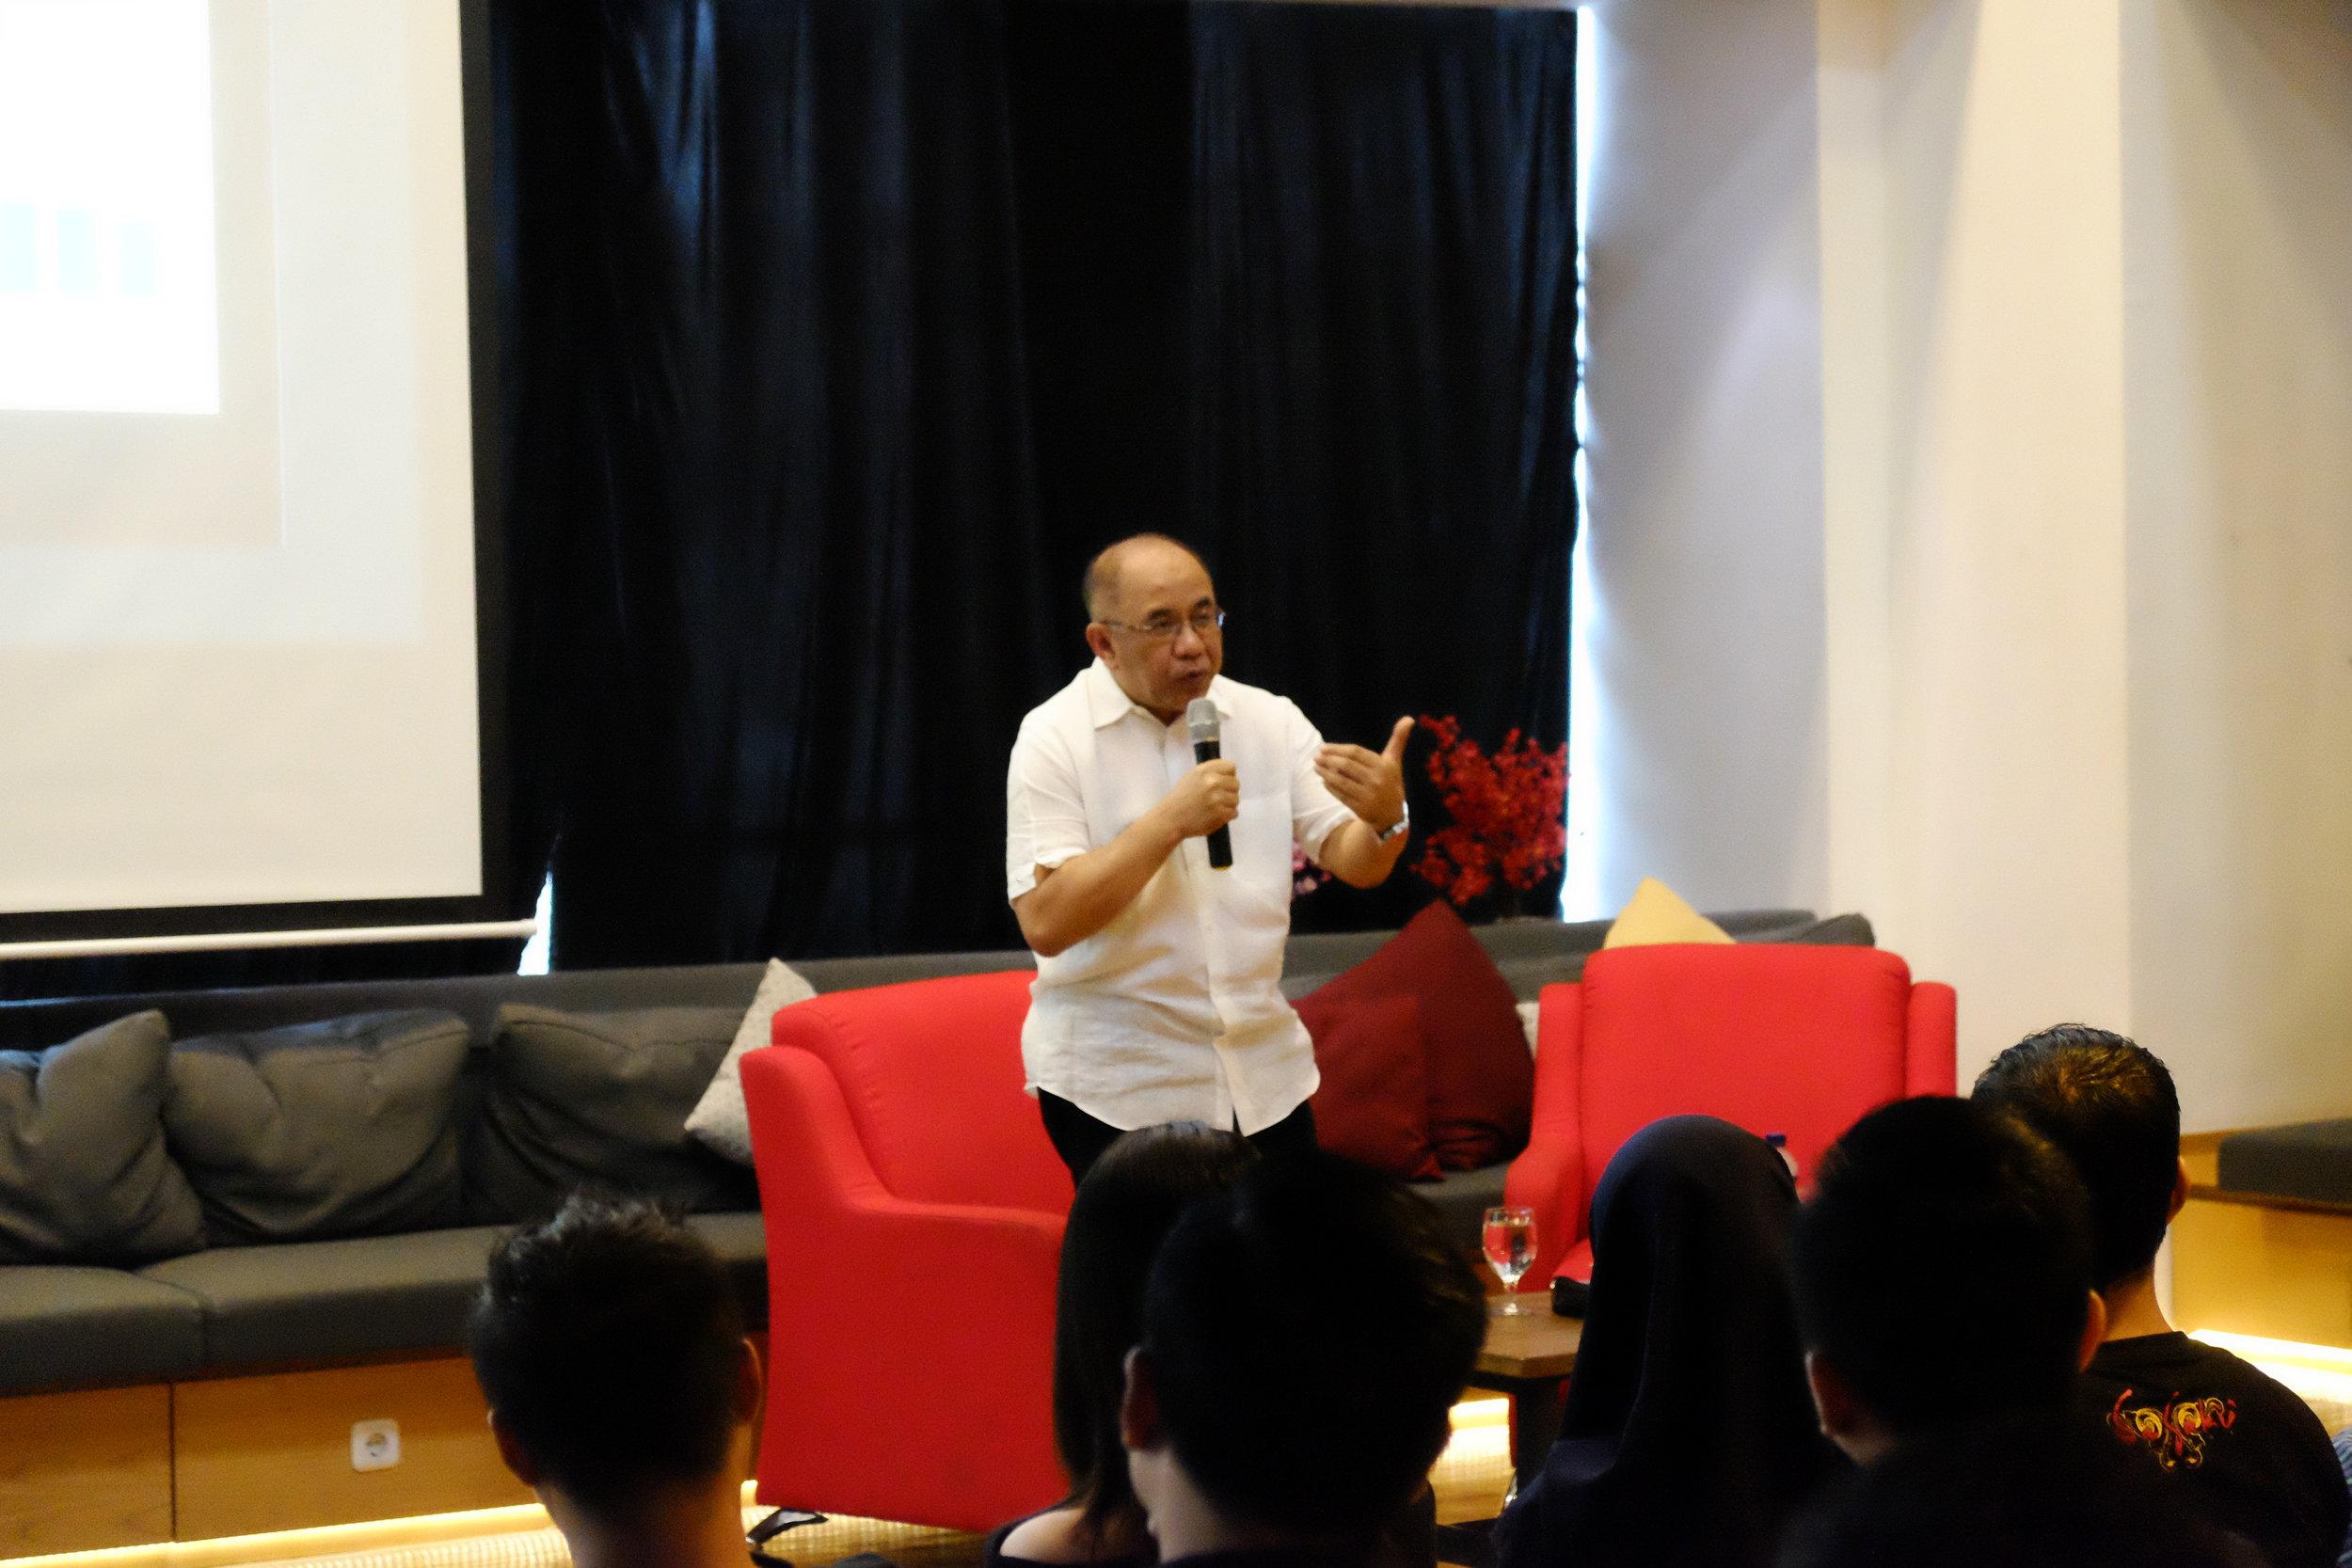 Joeliardi Sunendar - Indonesia Value Investor